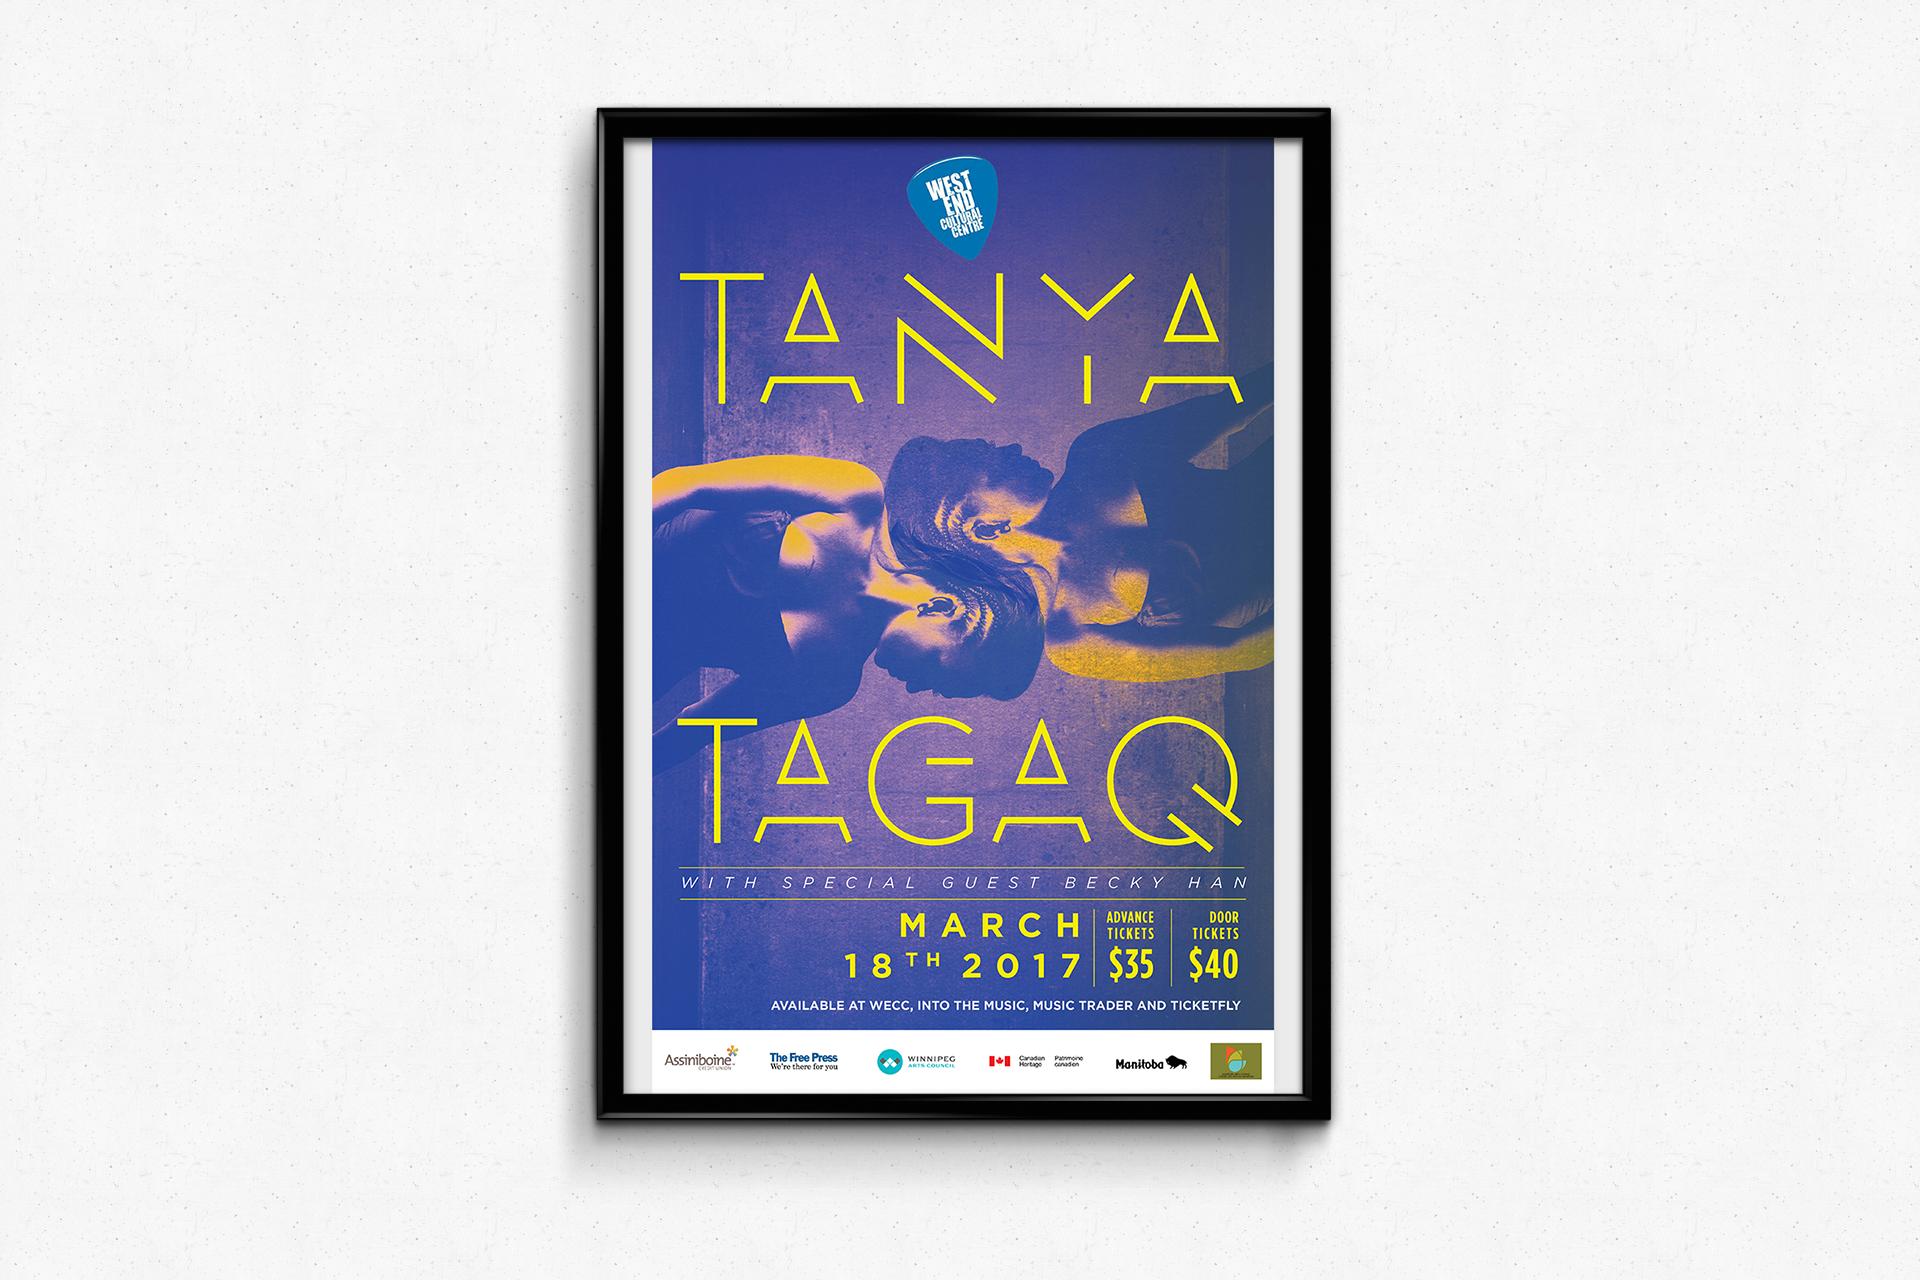 Tanya Tagaq @ The WECC